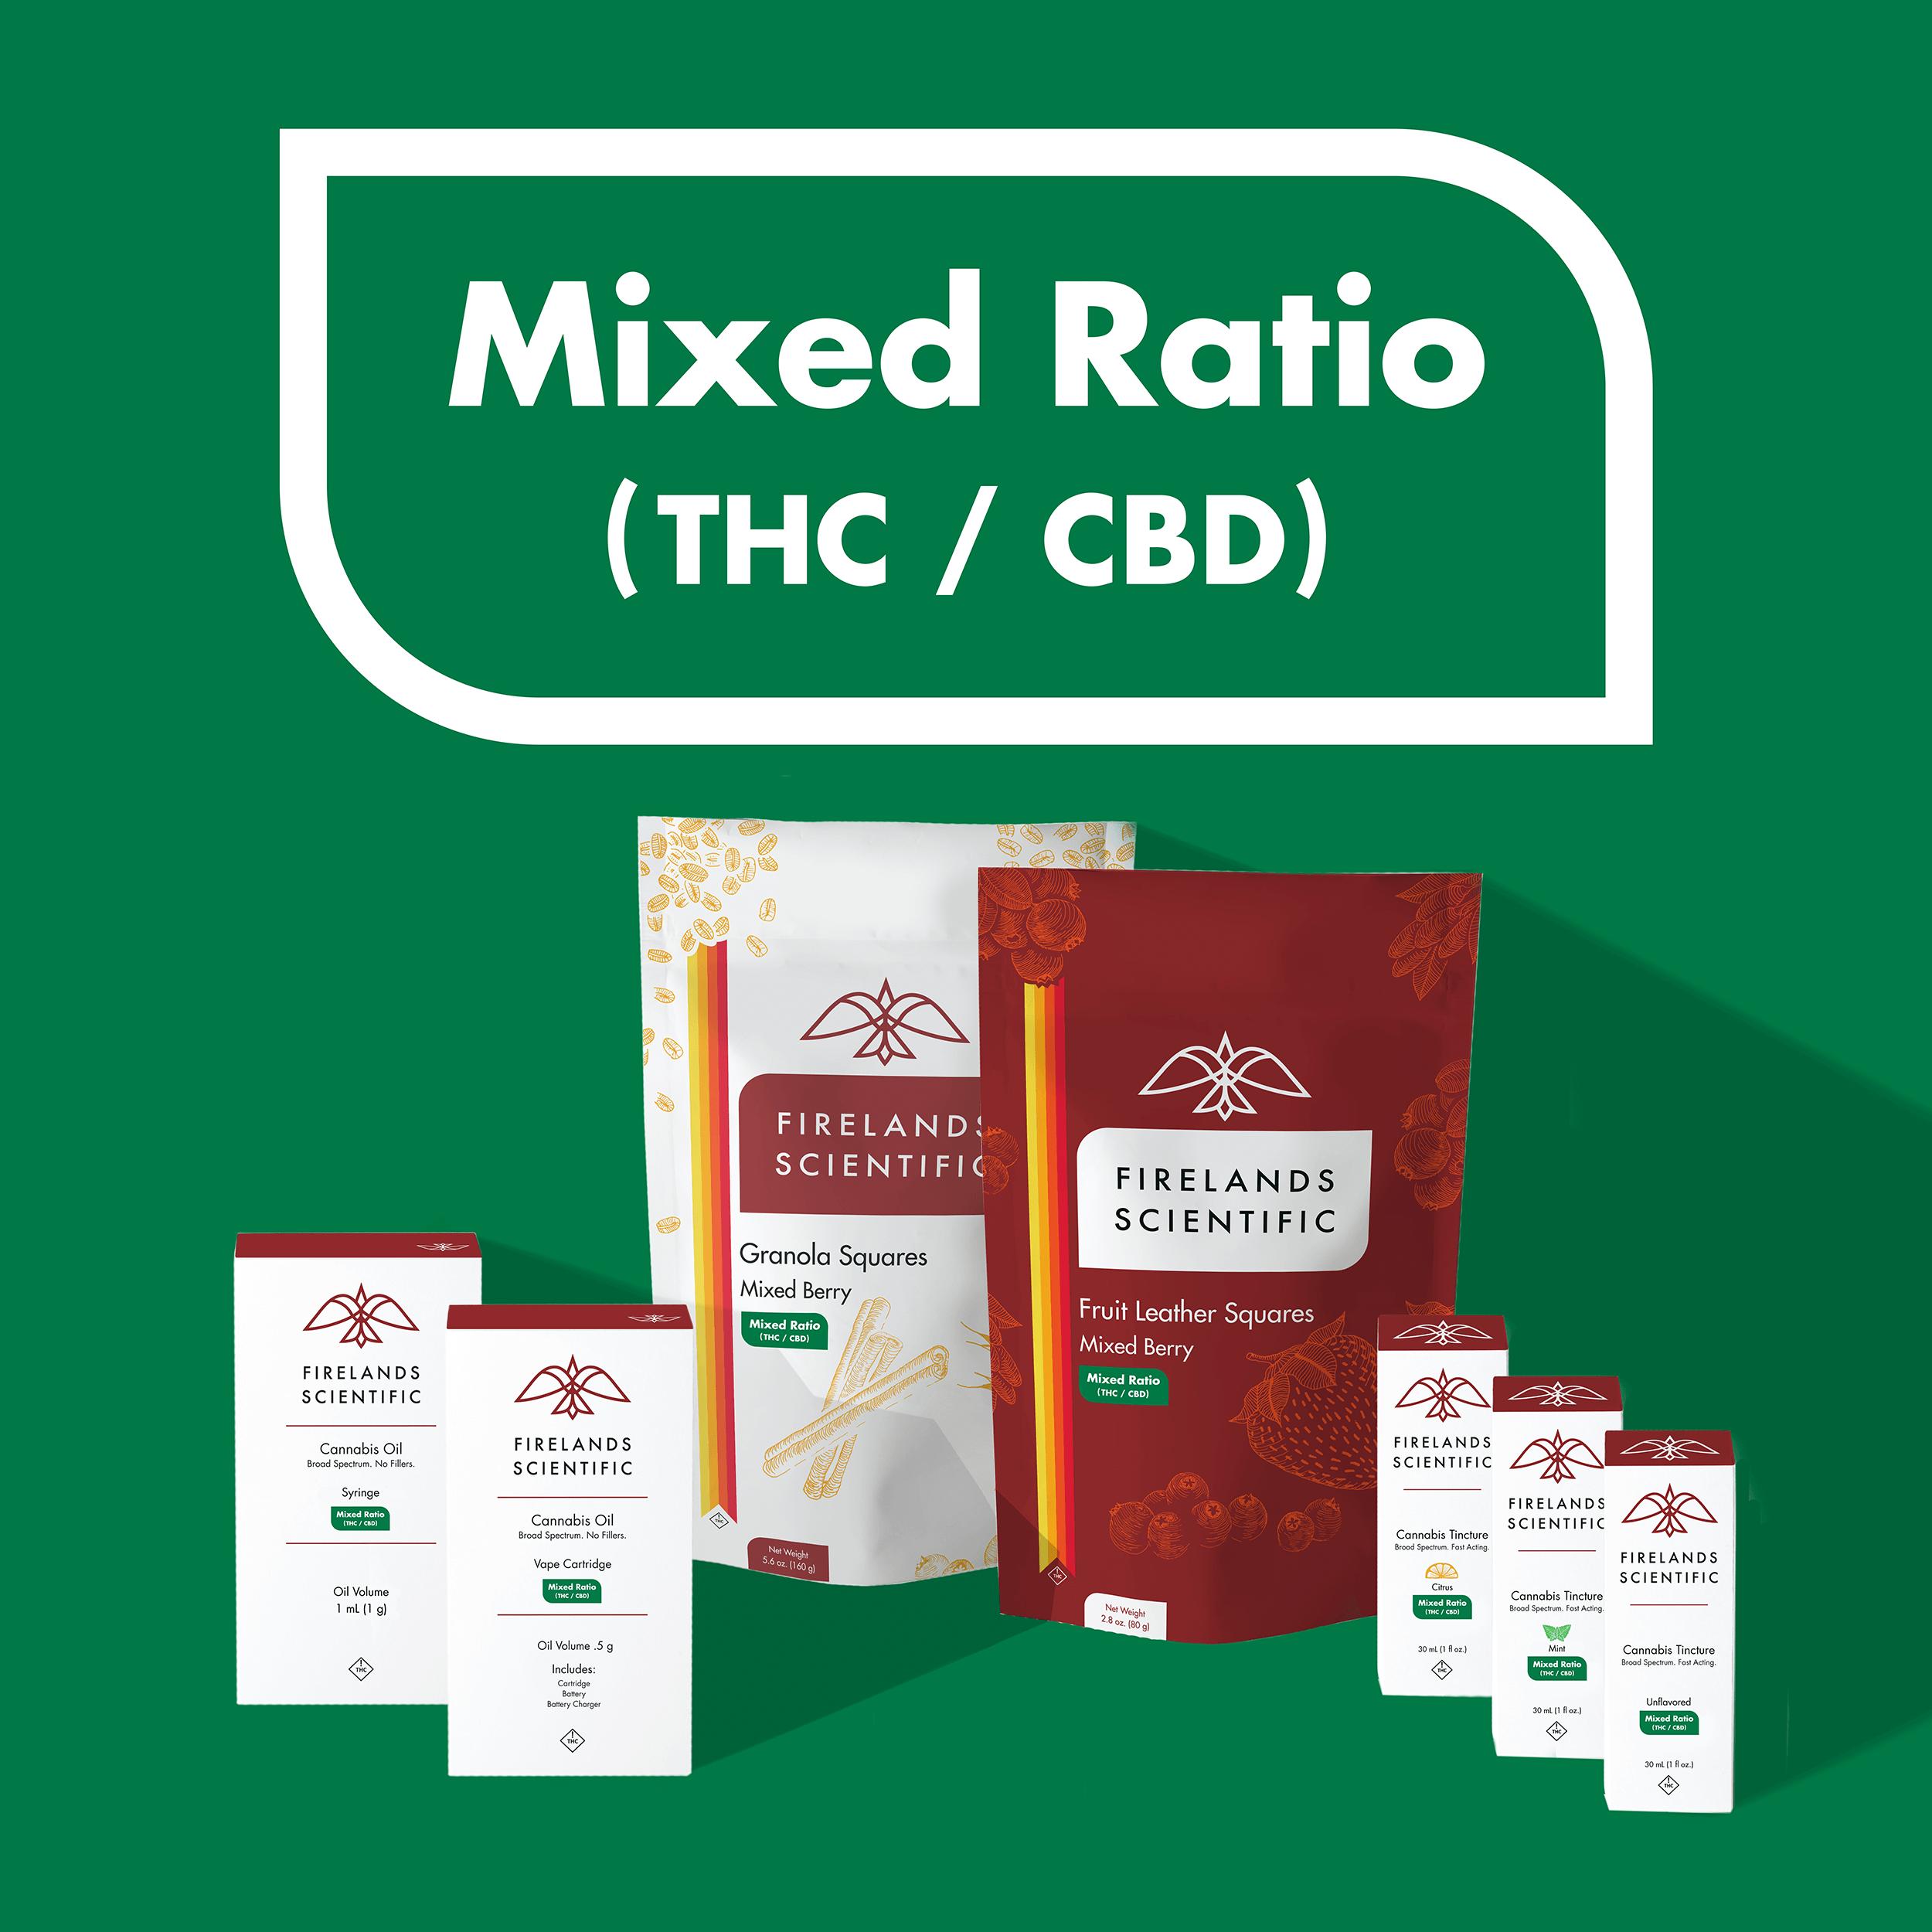 Mixed Ratio